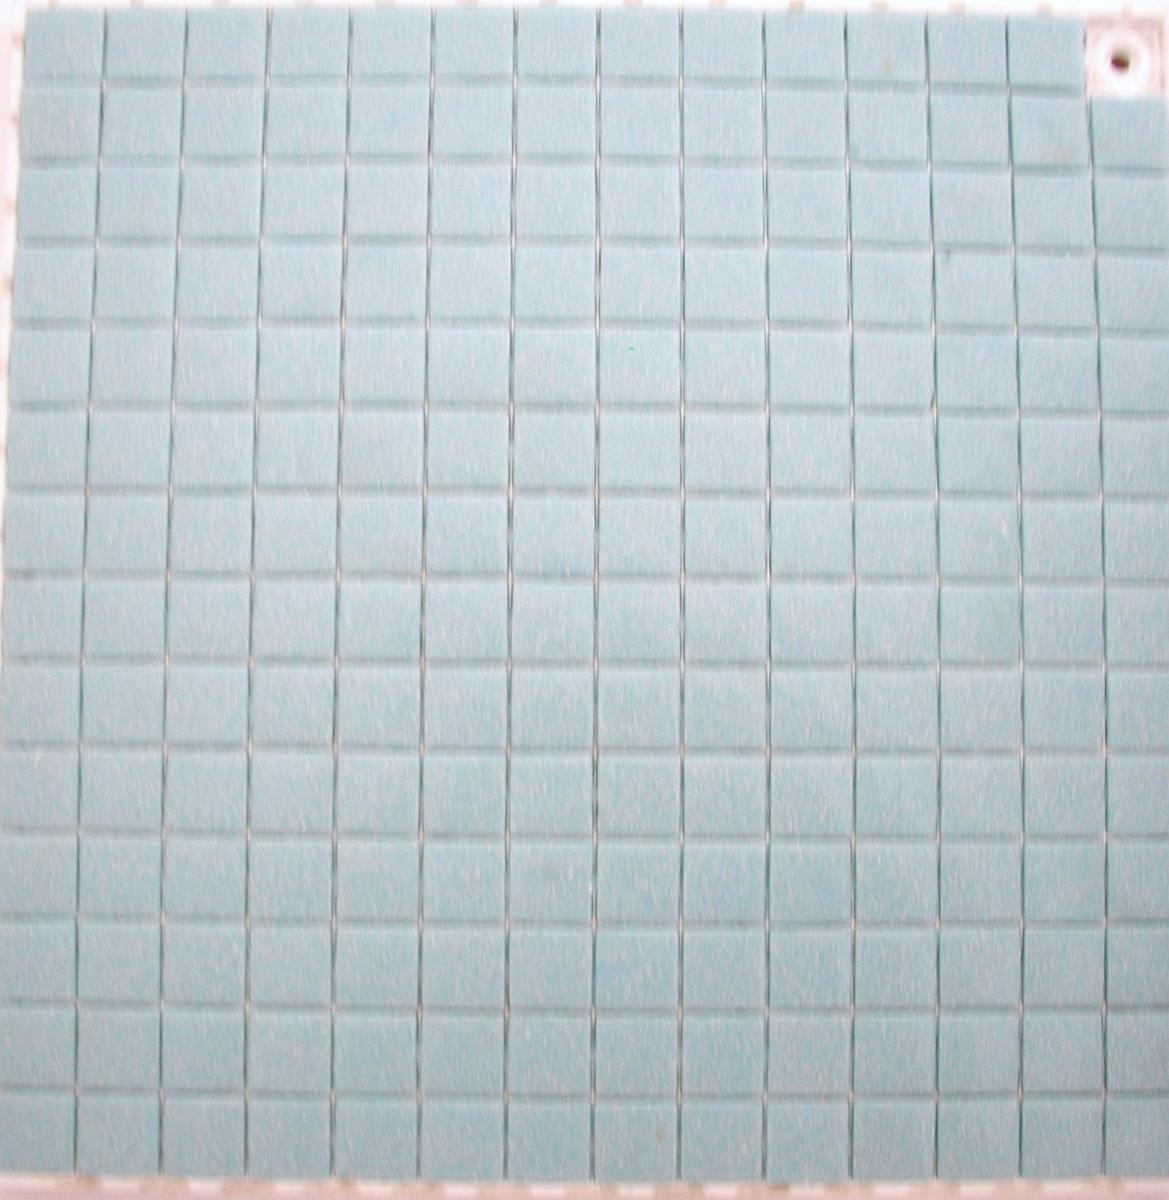 Bleu Turquoise Clair Granite 2 4 Cm Mosaique Emaux Au M